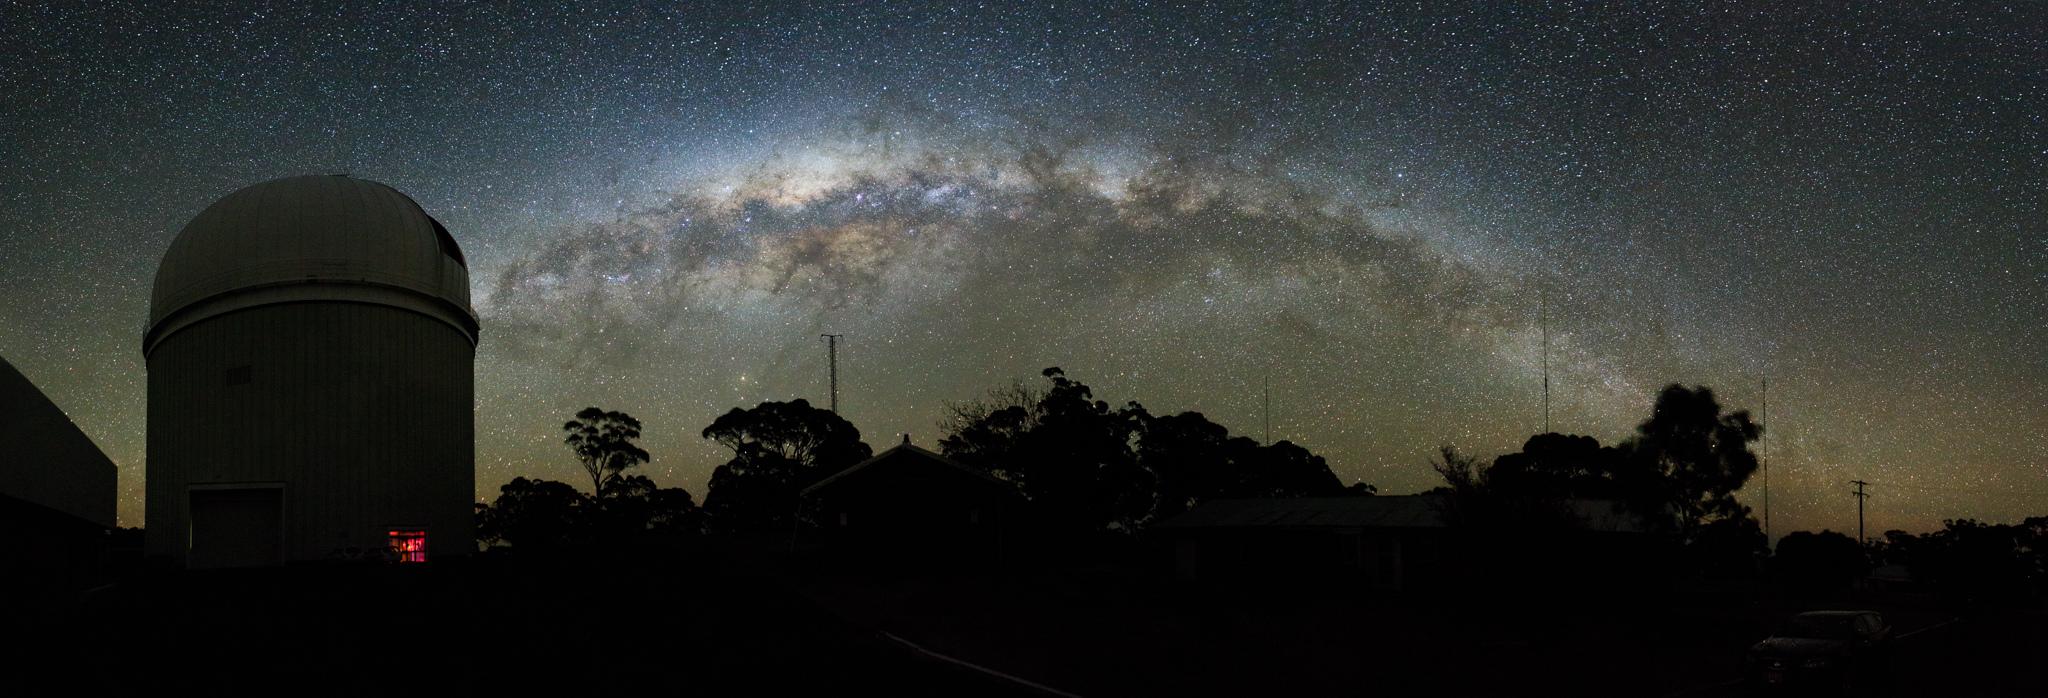 telescope_and_milkyway